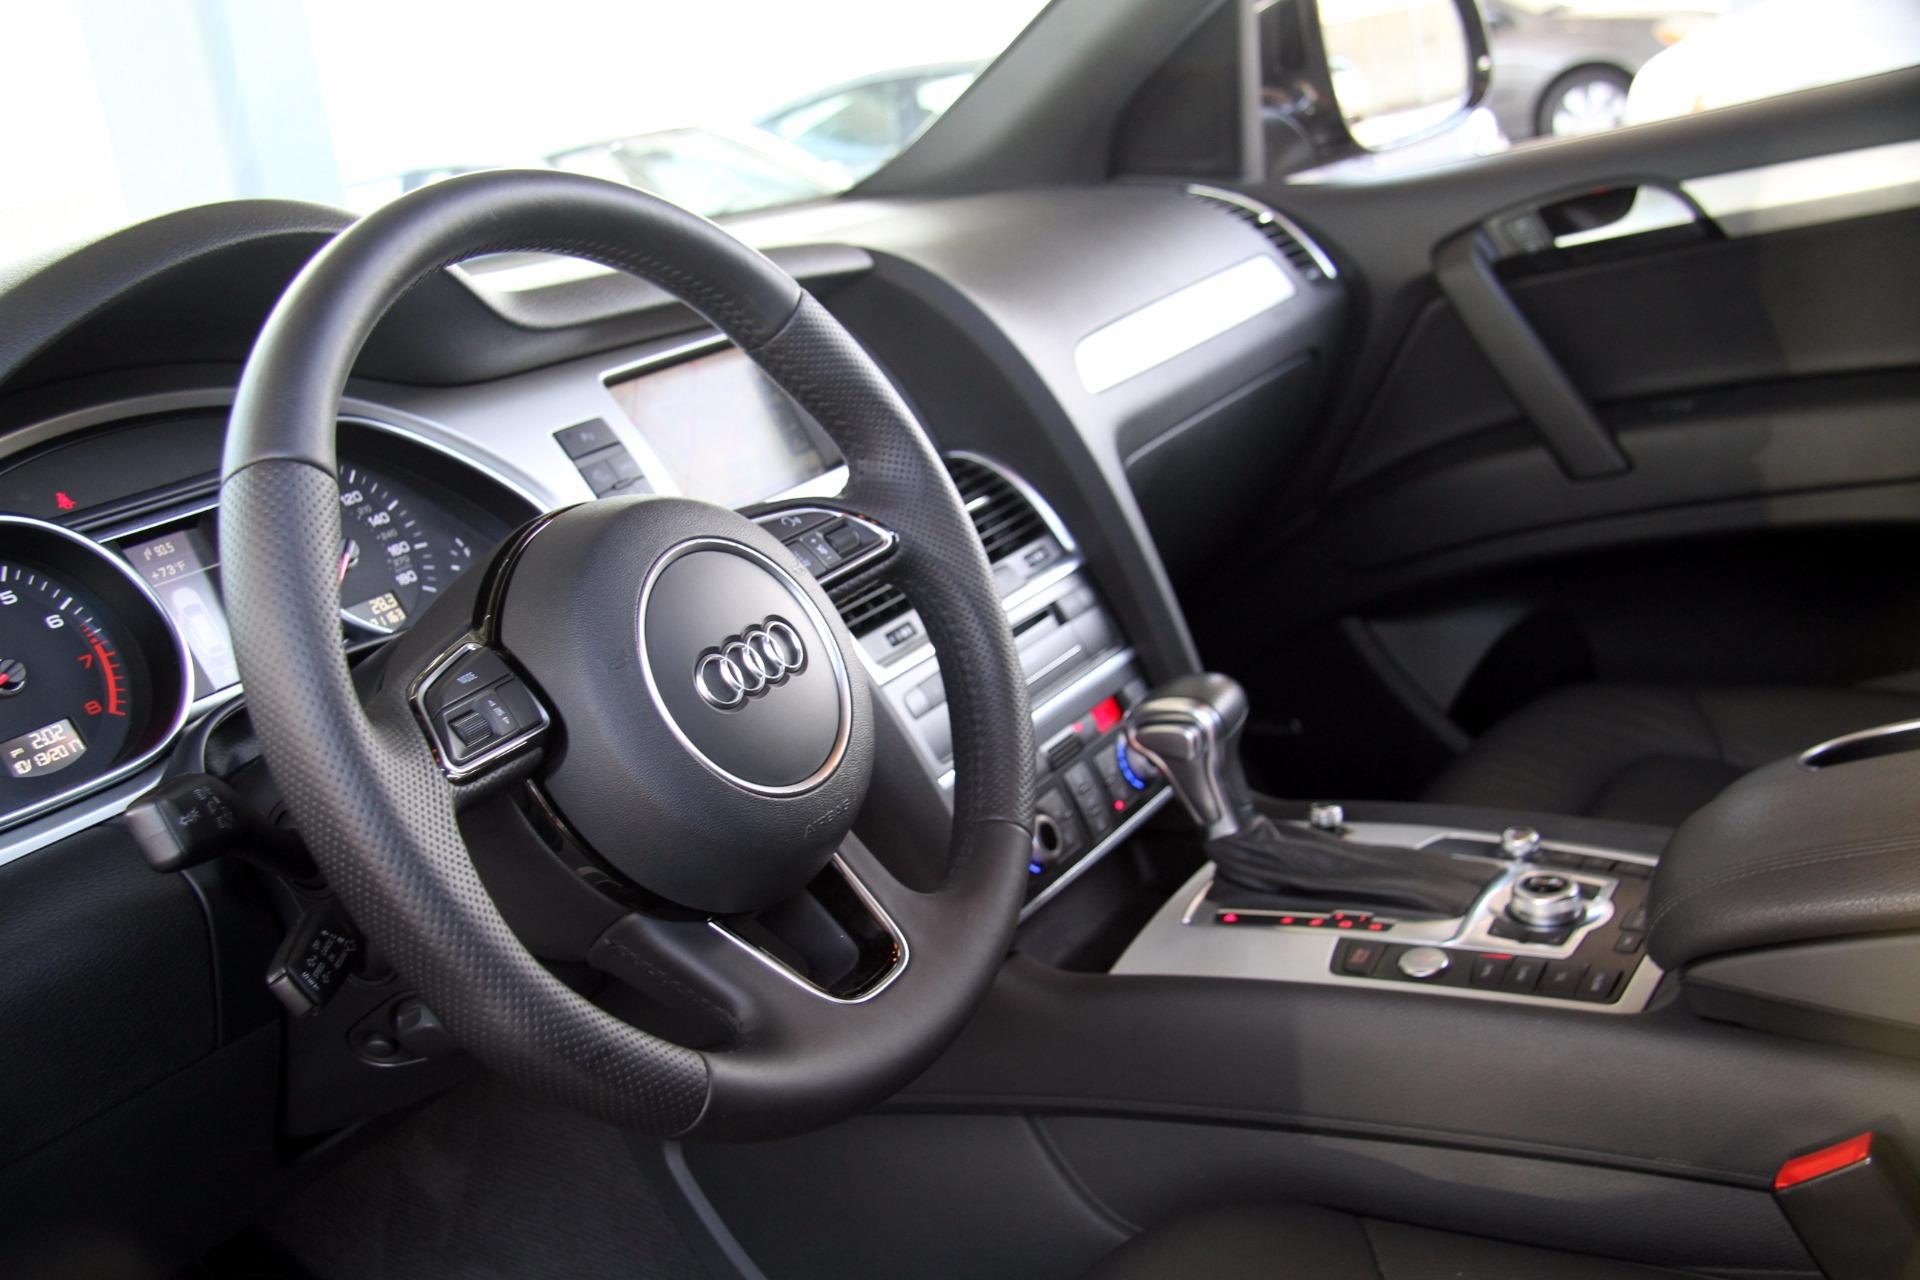 2014 Audi Q7 3.0T S-Line Prestige Stock # 6010 for sale near Redondo Beach, CA | CA Audi Dealer